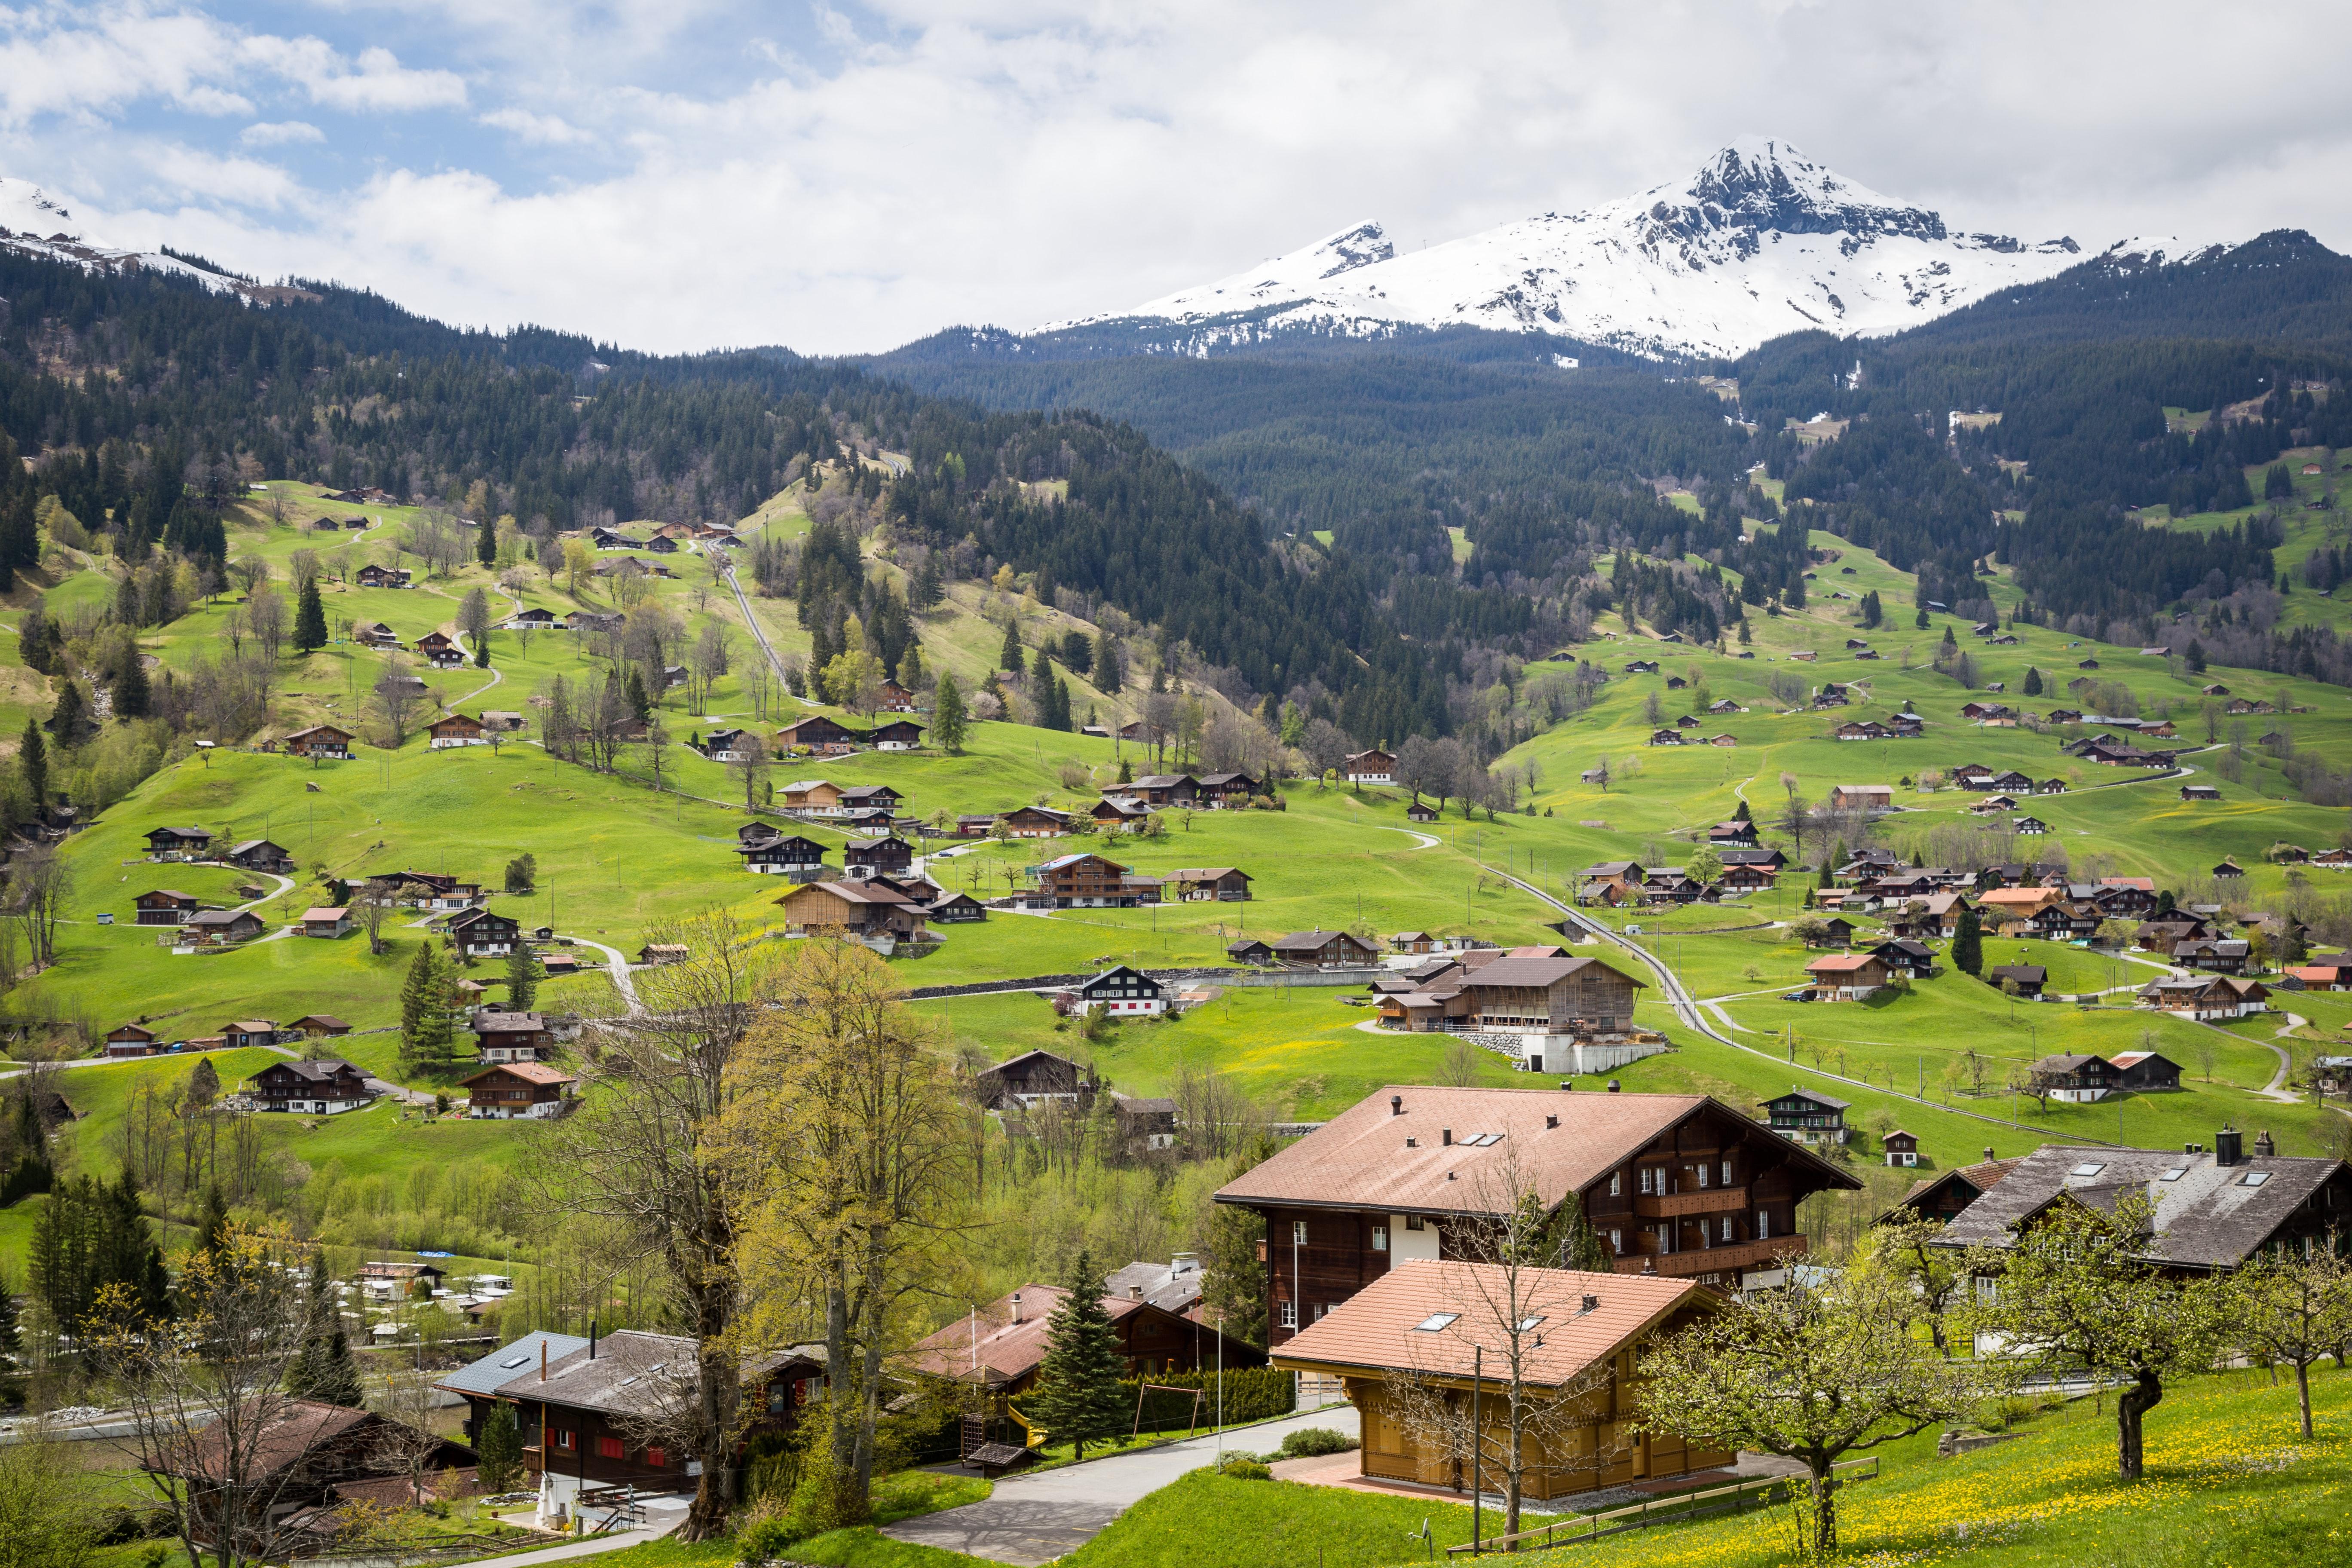 15 things to do to enjoy nightlife in Switzerland